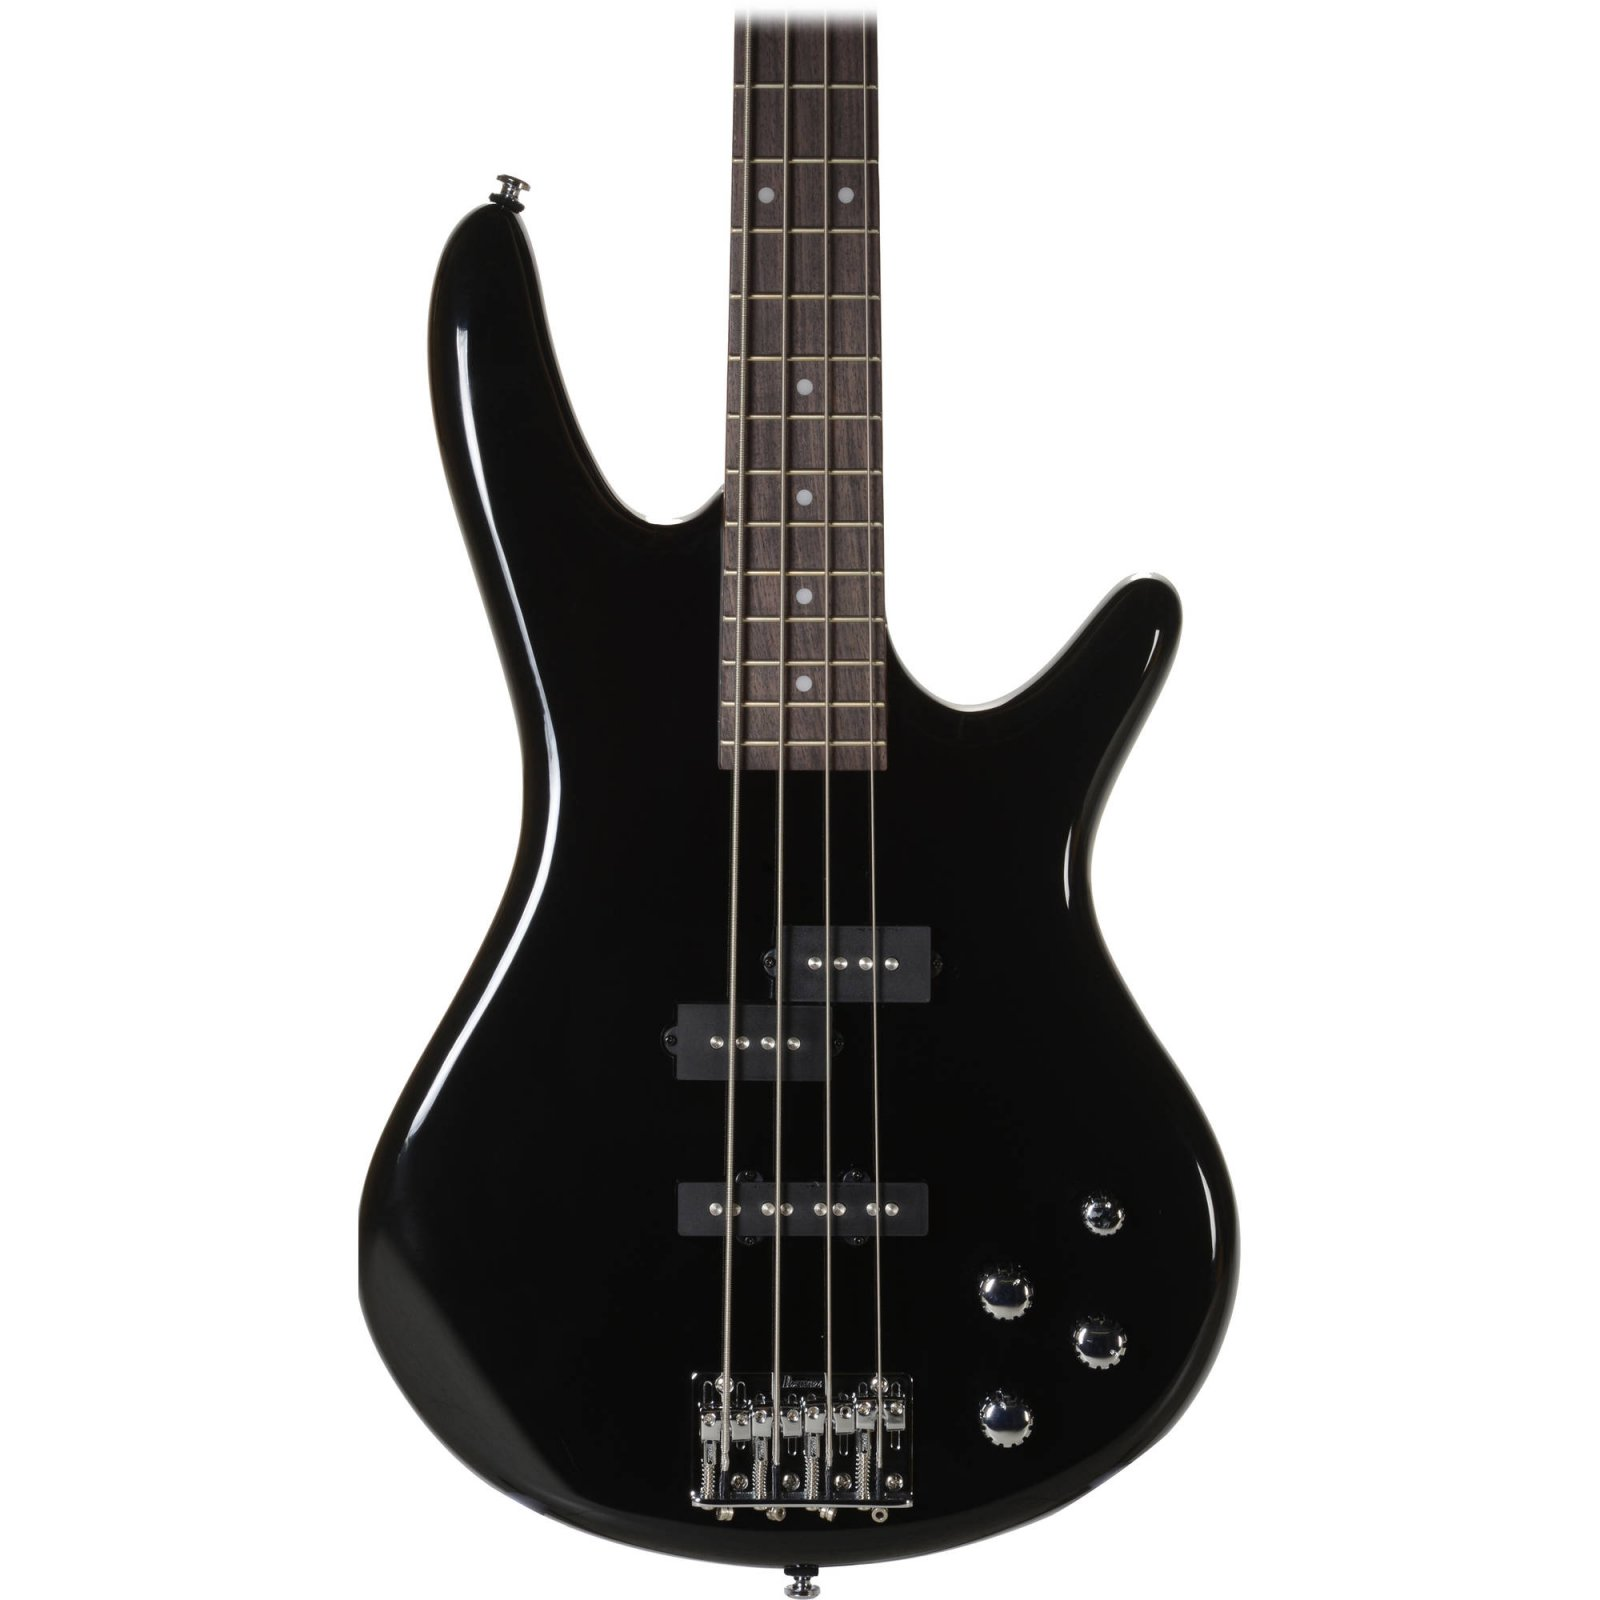 Ibanez Gio GSR200 Electric Bass Guitar - Black